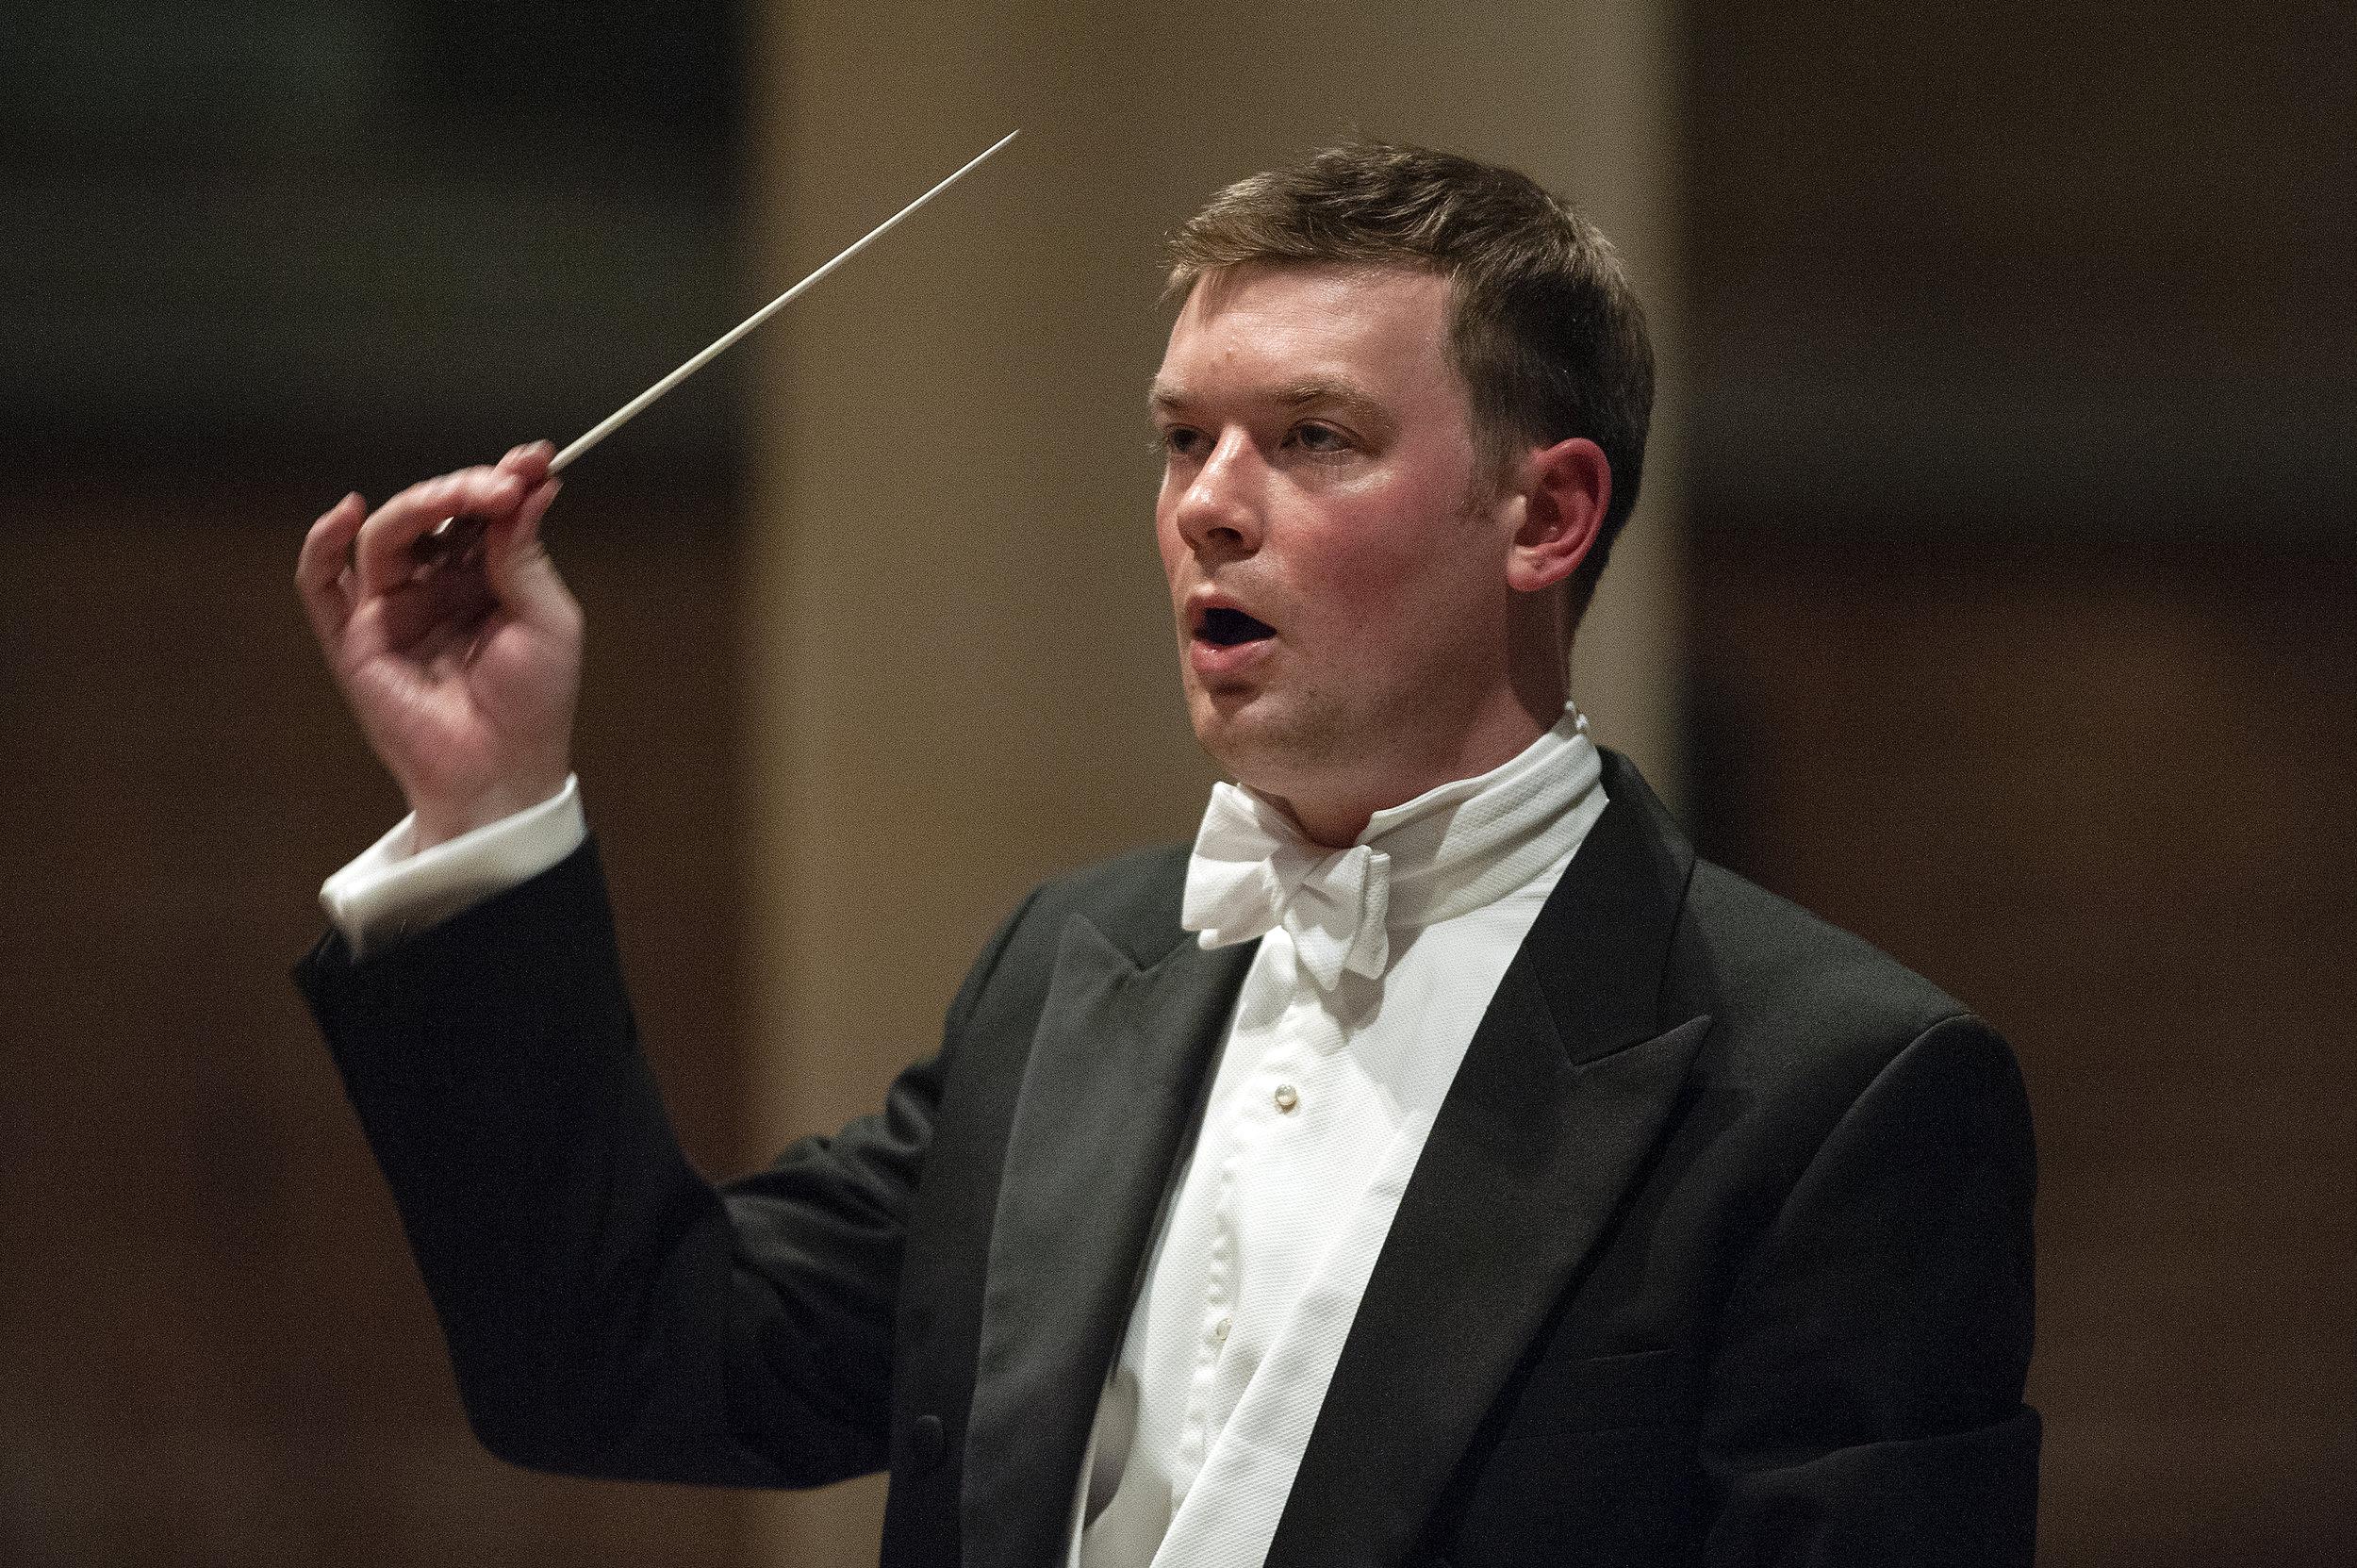 Conducting Mozart - Streatham Choral Spring 2019 concert